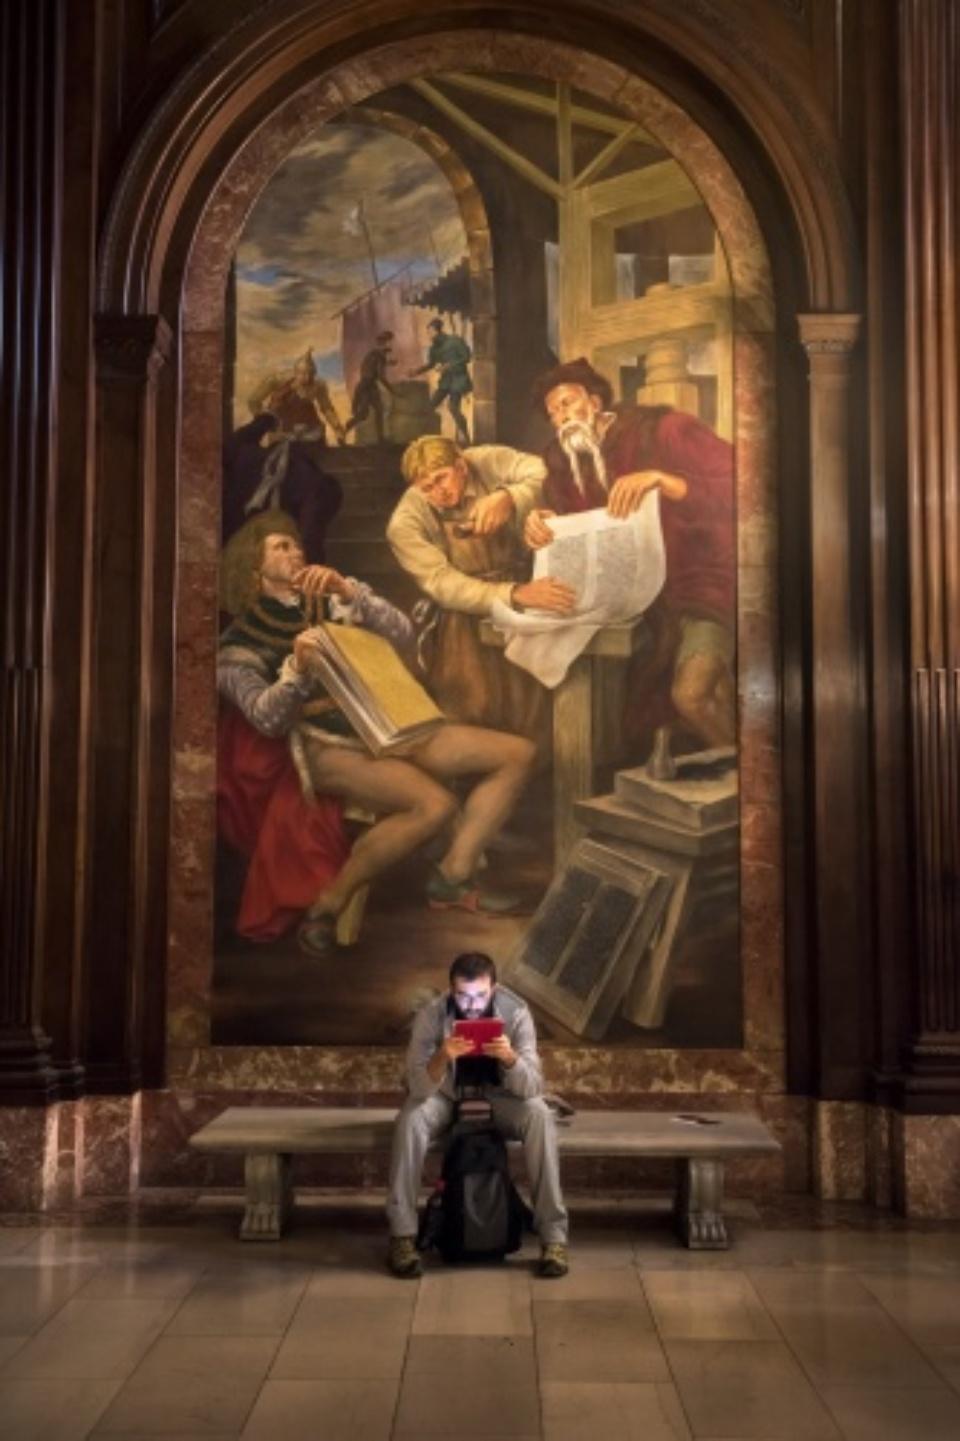 Steve McCurry: New York City Library New York, 2015